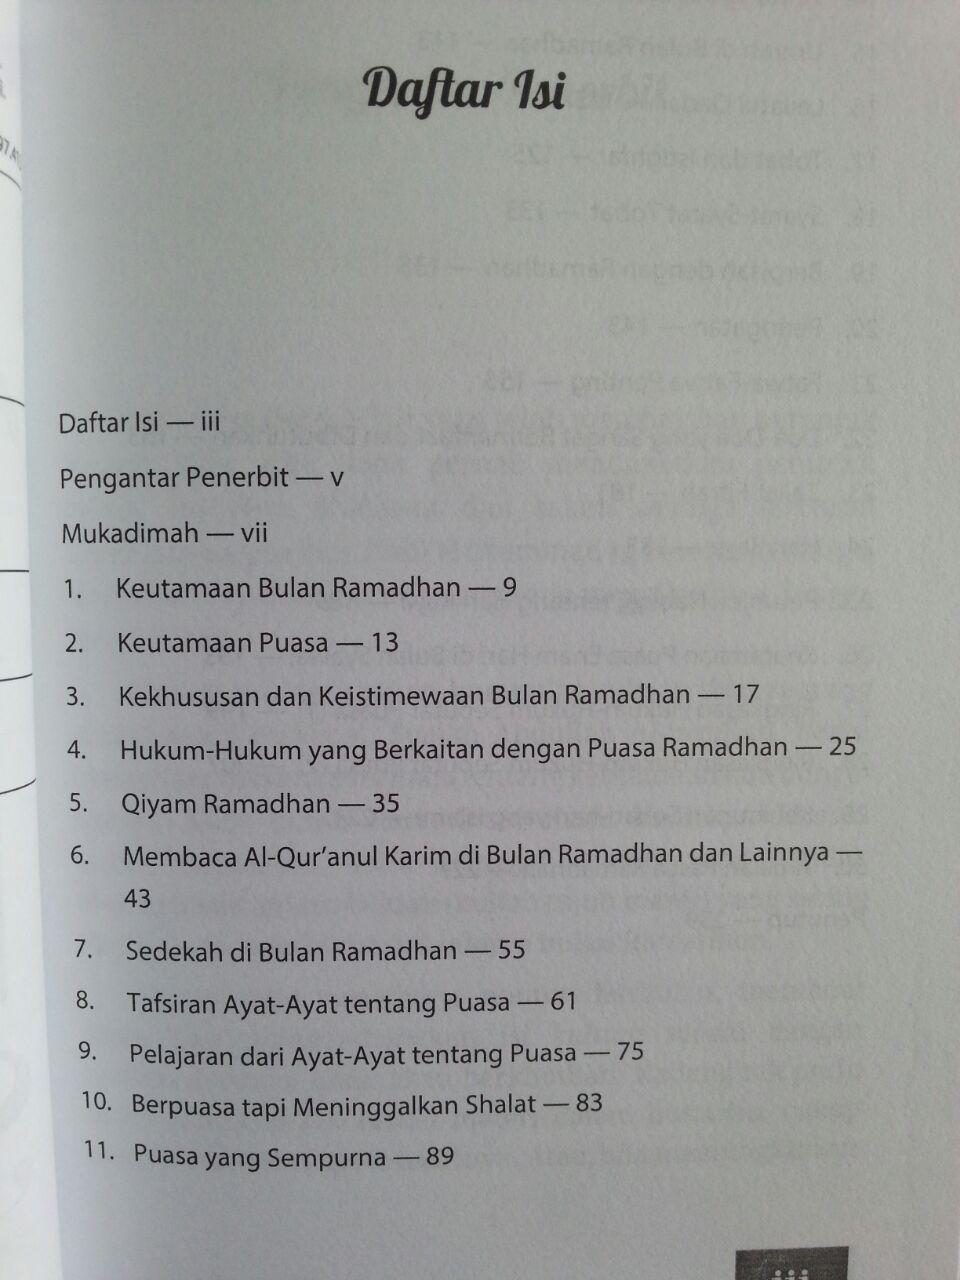 Buku Risalah Ramadhan Materi Kultum Sebulan isi 2